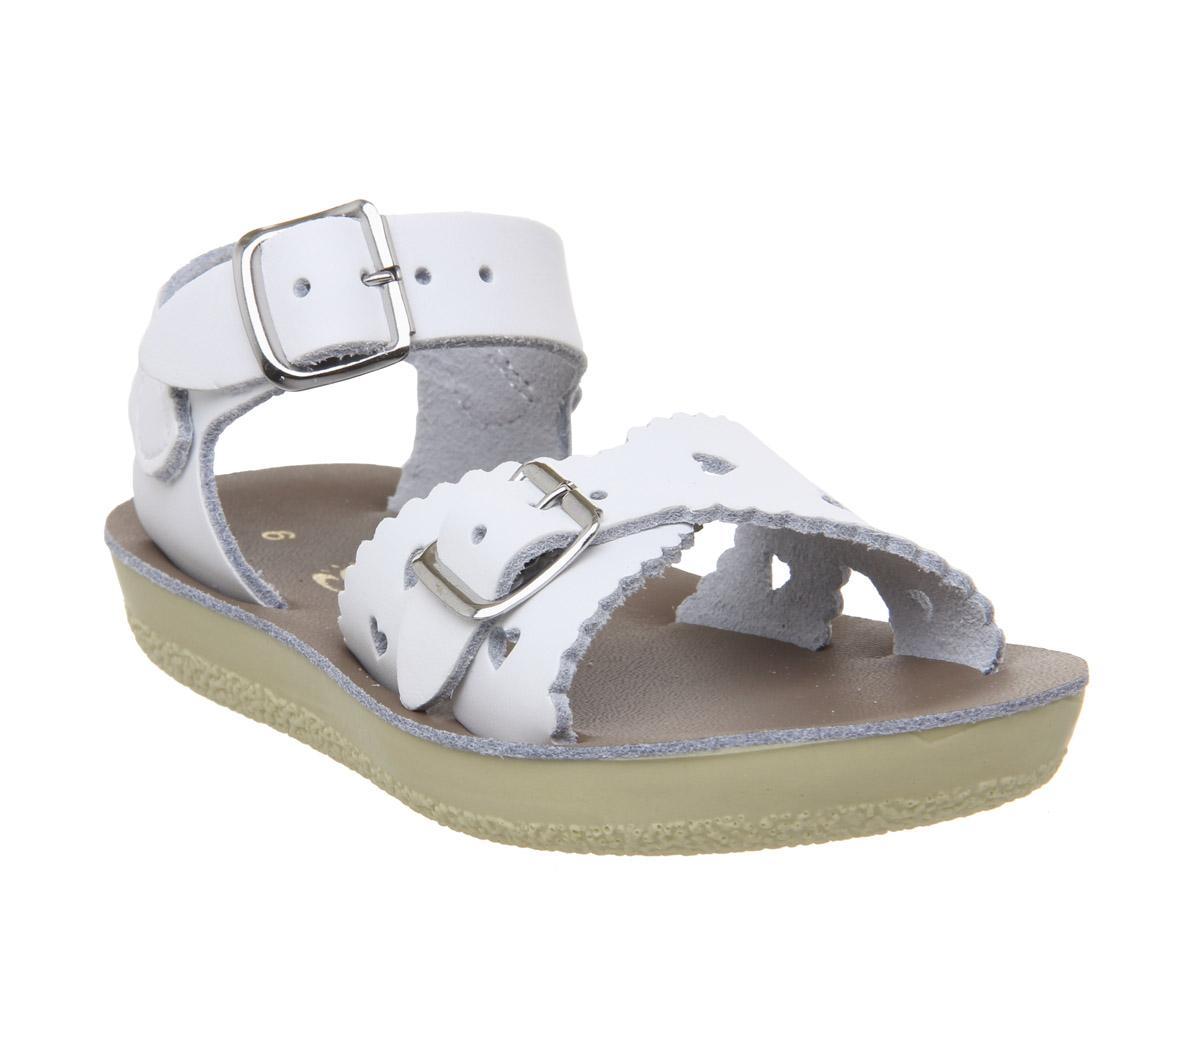 Sweetheart 4-7 Sandals